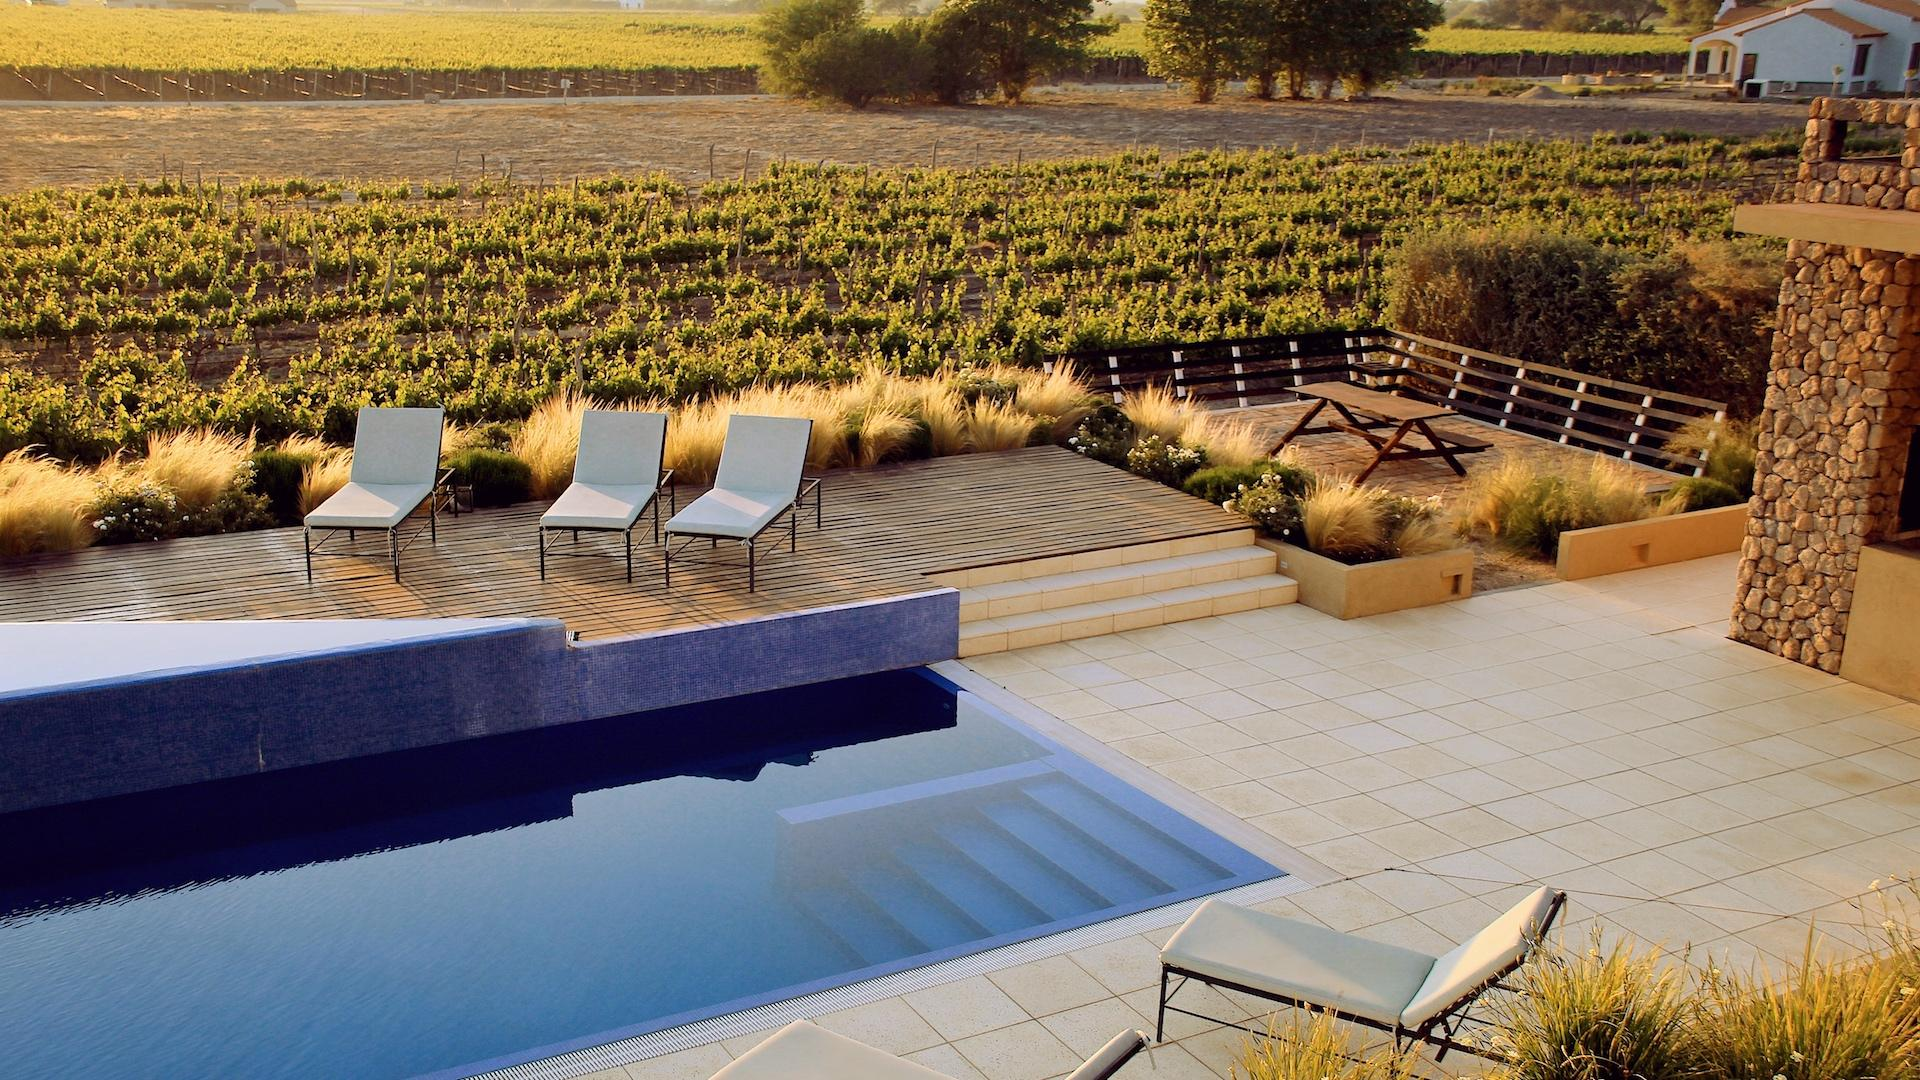 grace-hotel-cafayate-salta-resort-argentina-norbertosica-16102016-in5